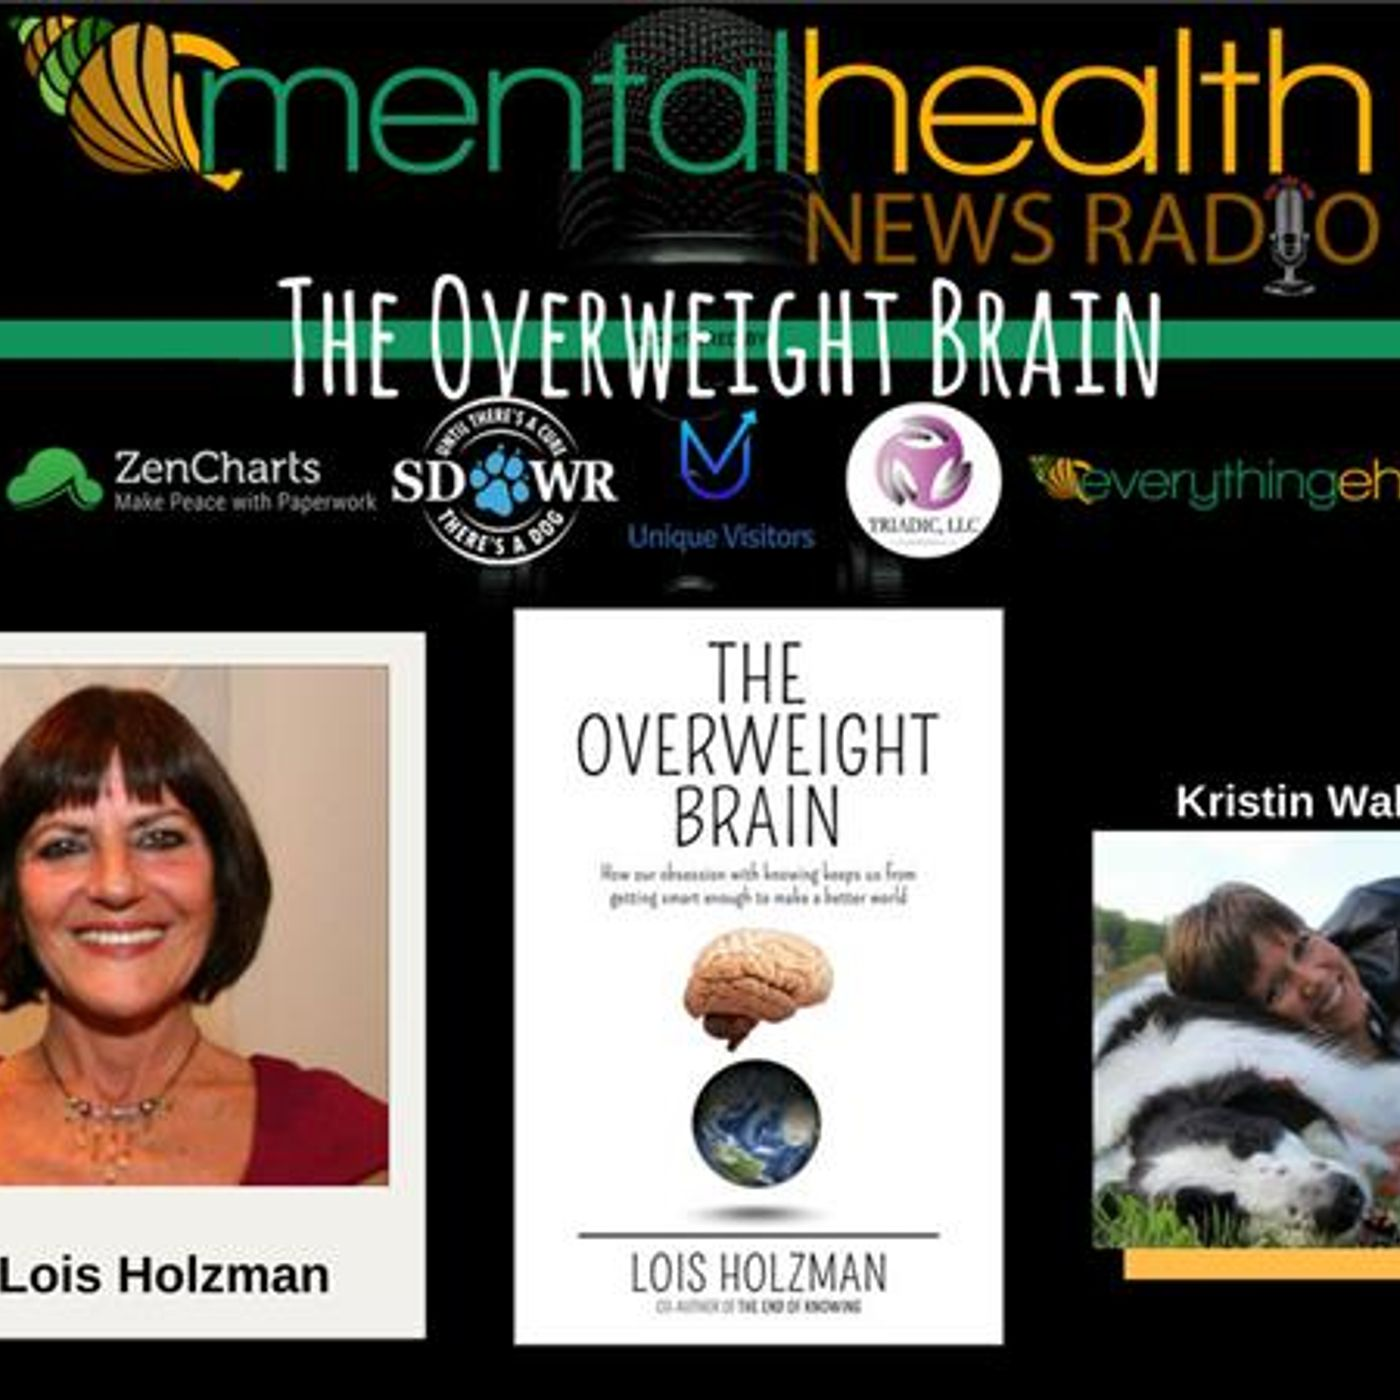 Mental Health News Radio - The Overweight Brain with Dr. Lois Holzman